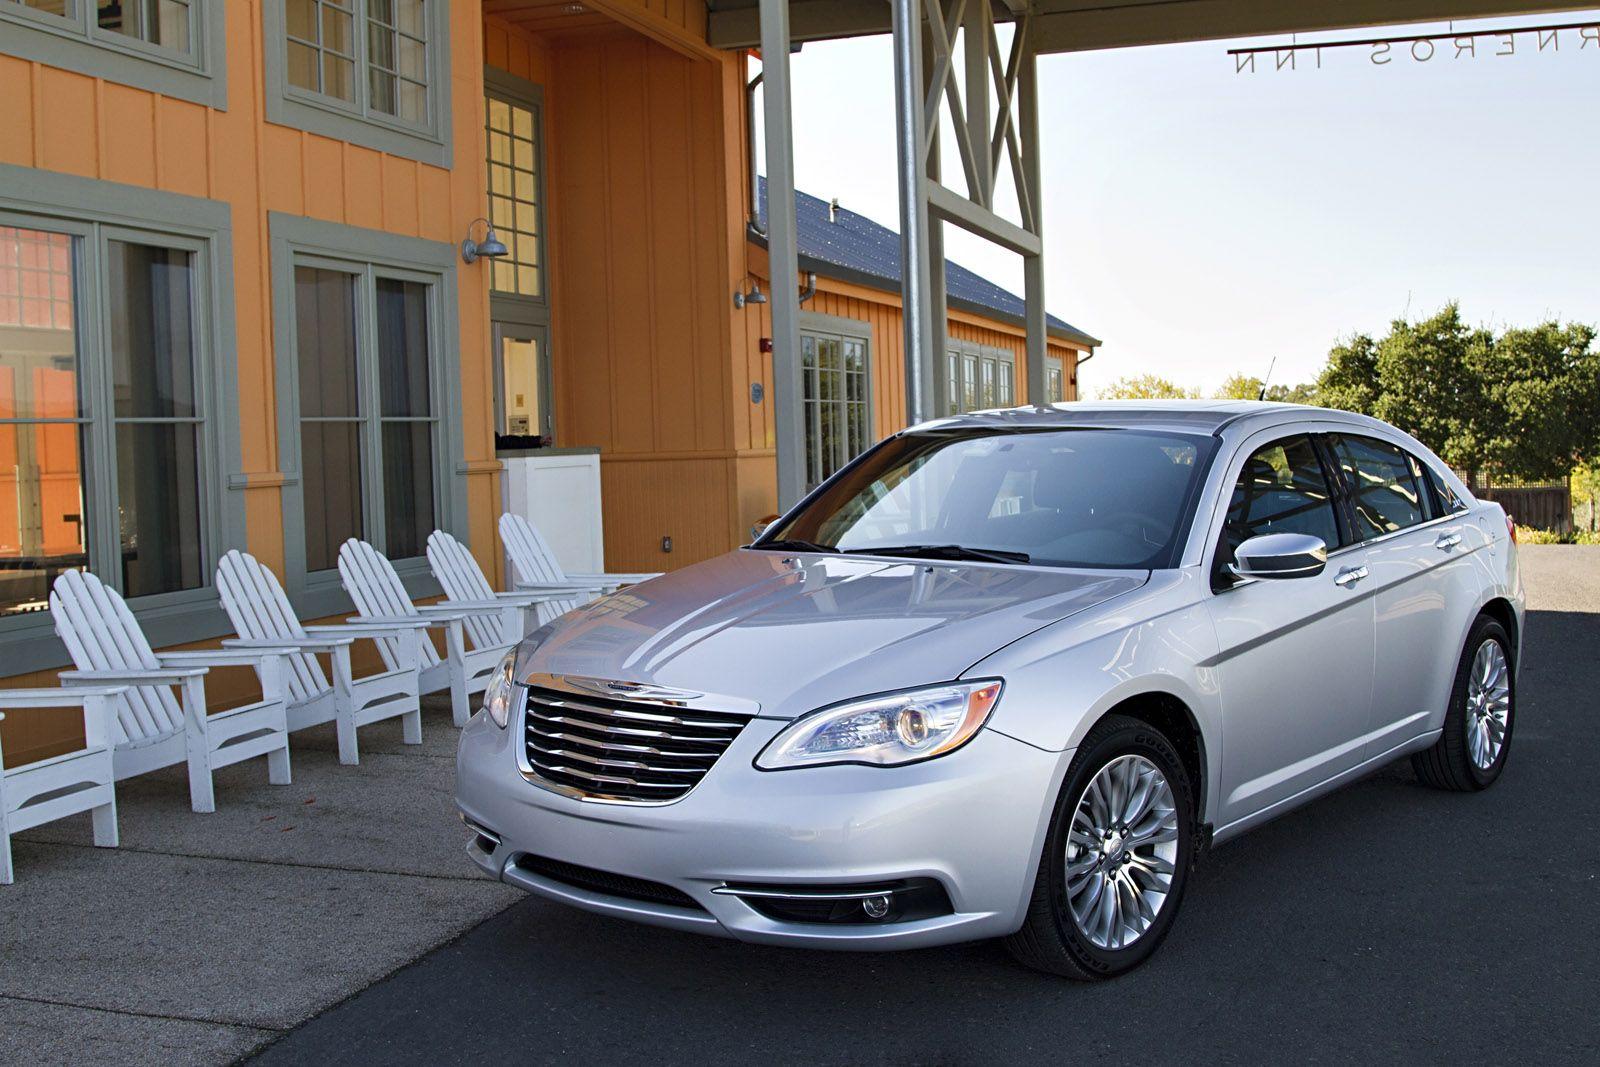 Chrysler 200 Mpg >> New Car Price Specification Review Images Chrysler 200